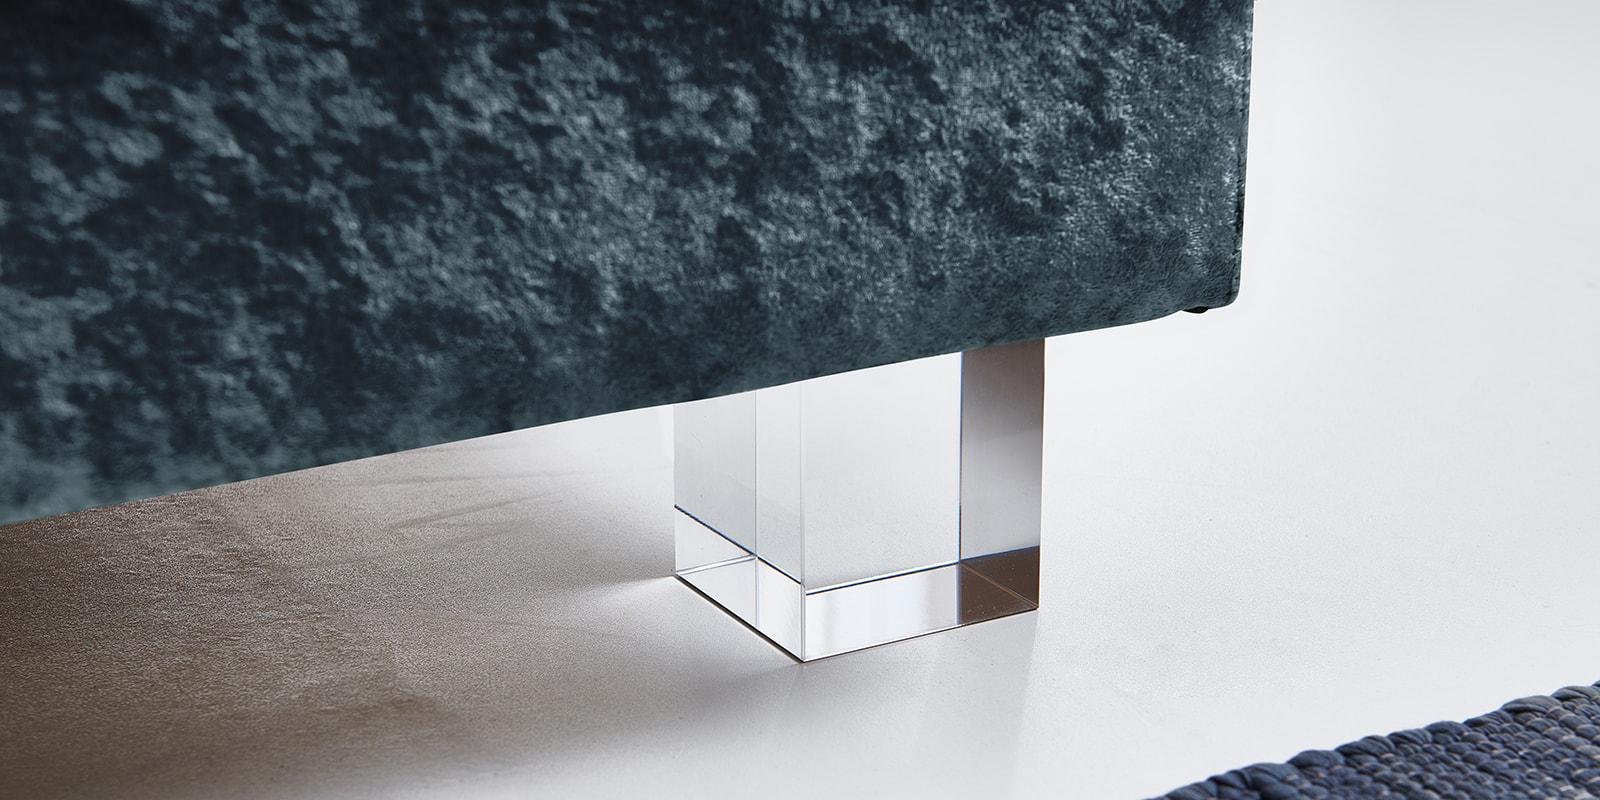 Moebella24 - Boxspringbett - Petrol - Samt - Acryl Füße eckig - Glas Optik